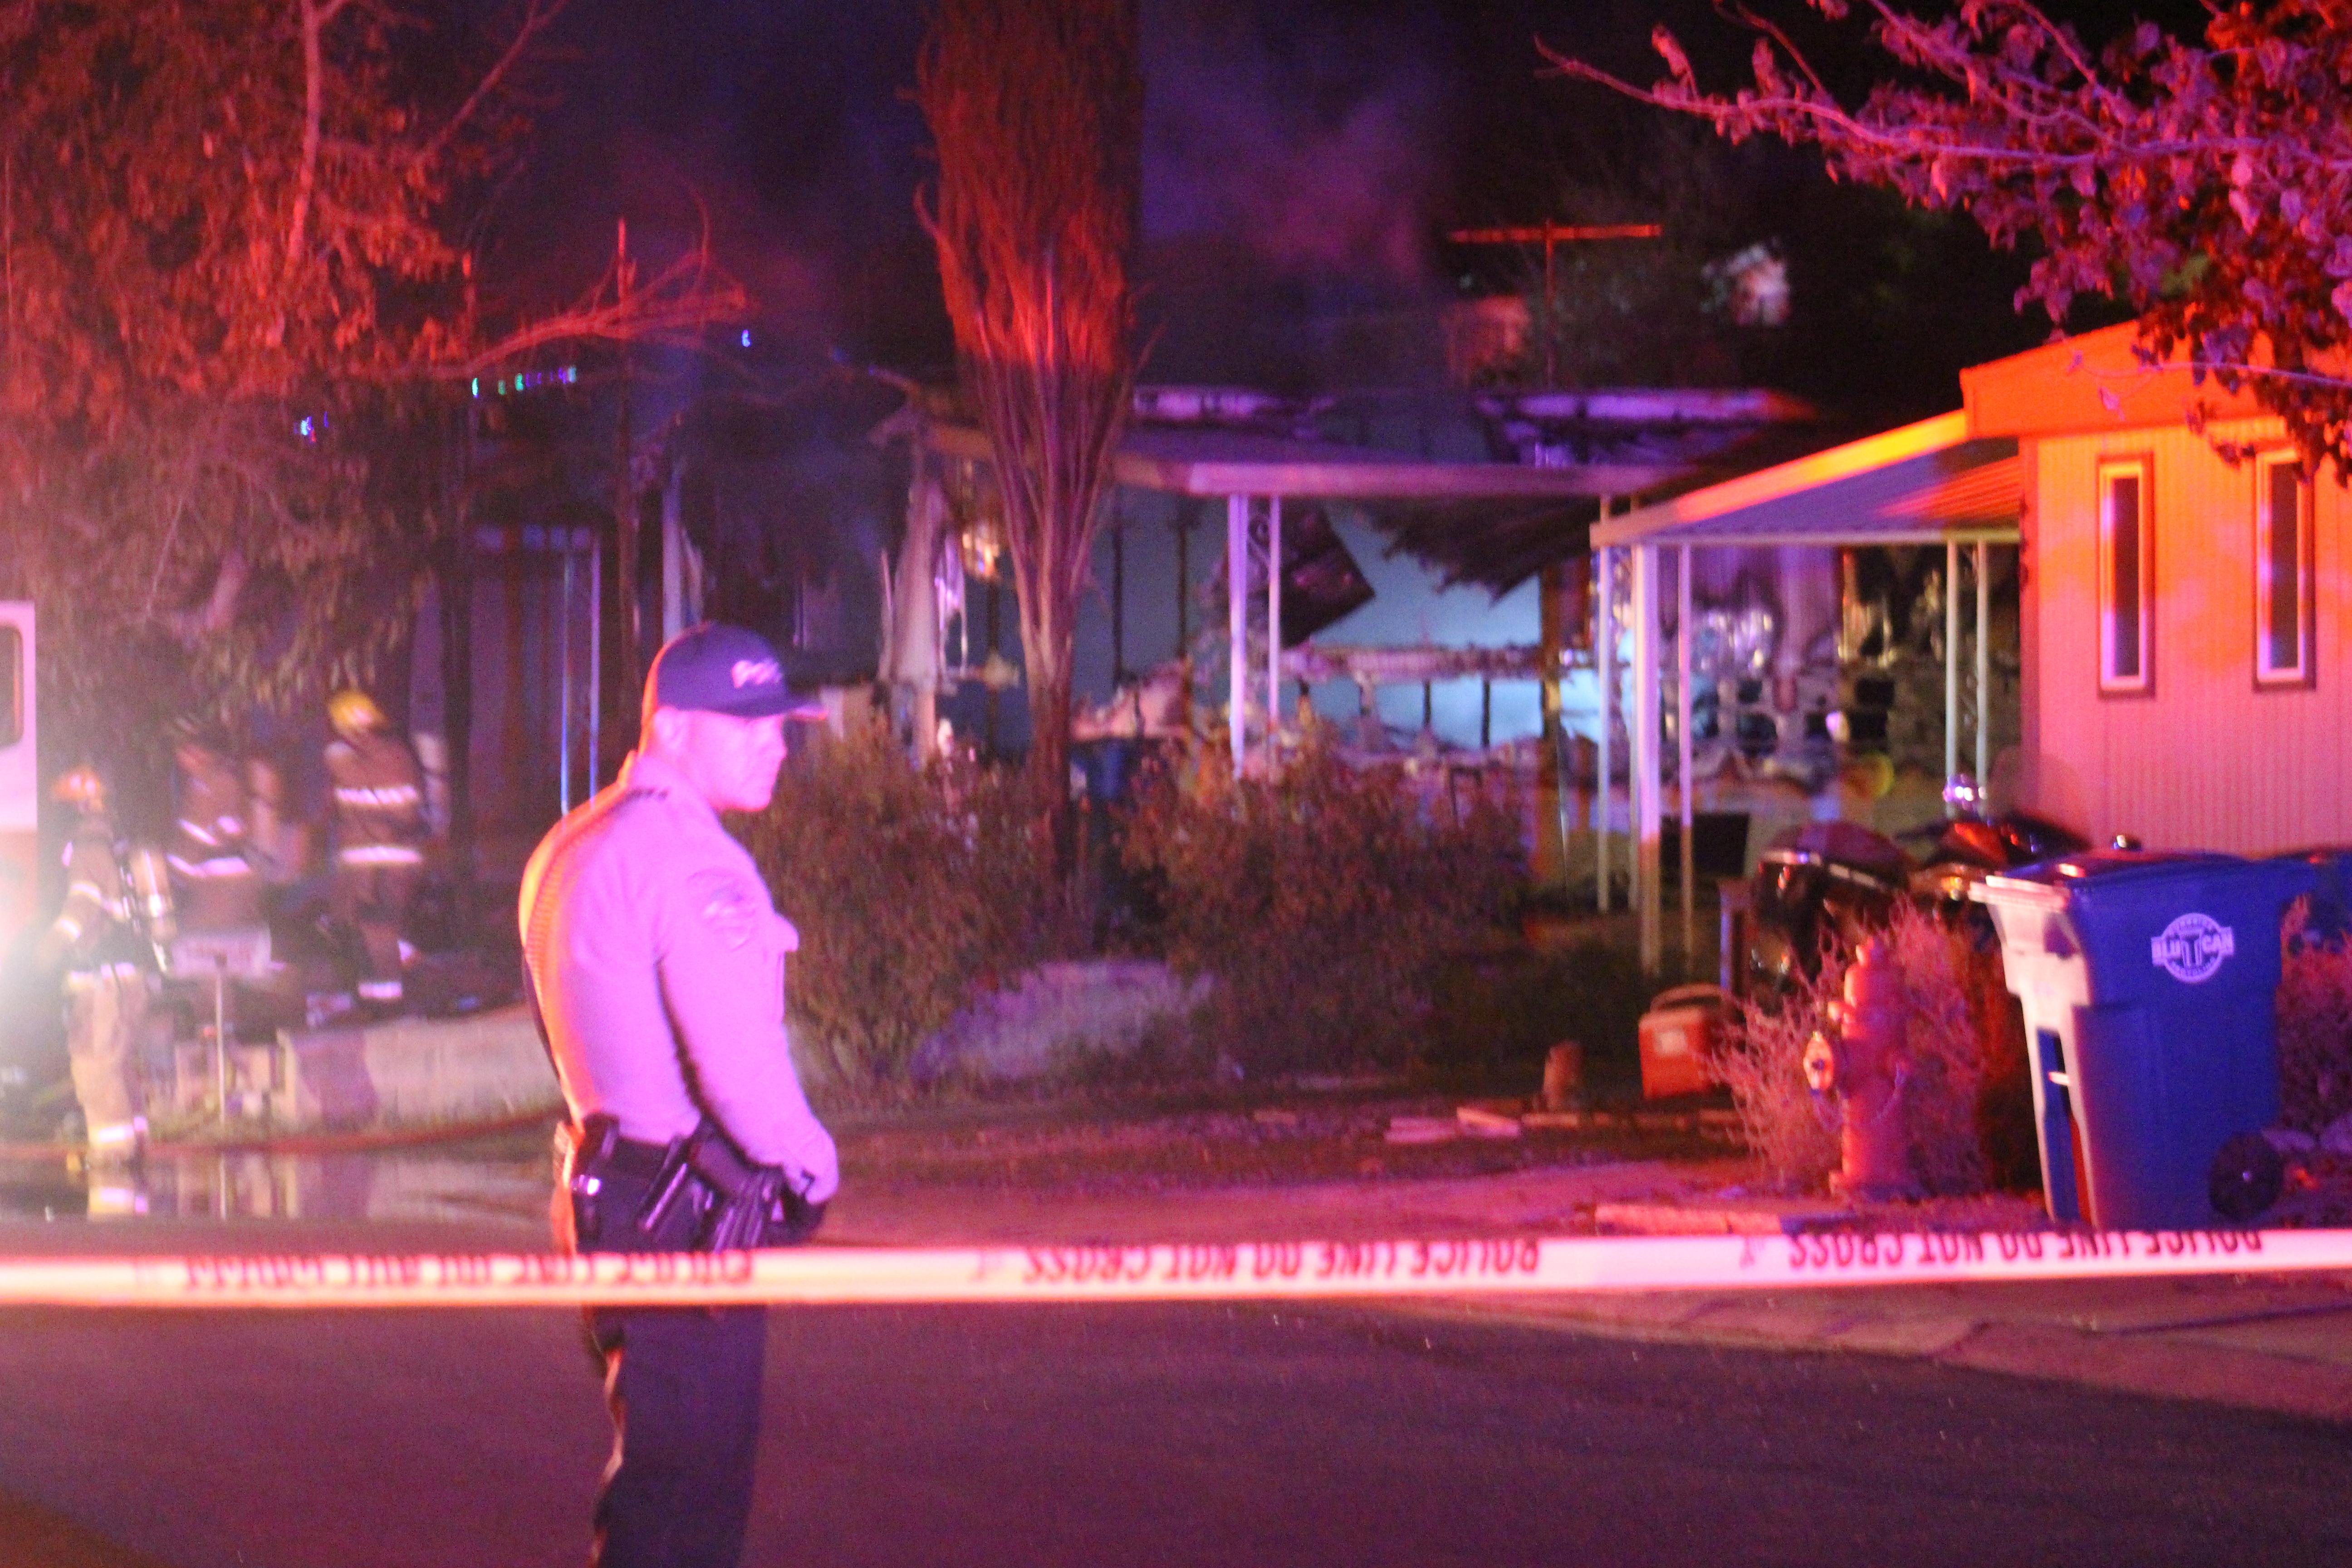 Washington City Police respond to a mobile home fire, Washington, Utah, Dec. 5, 2016 | Photo by Joseph Witham, St. George News